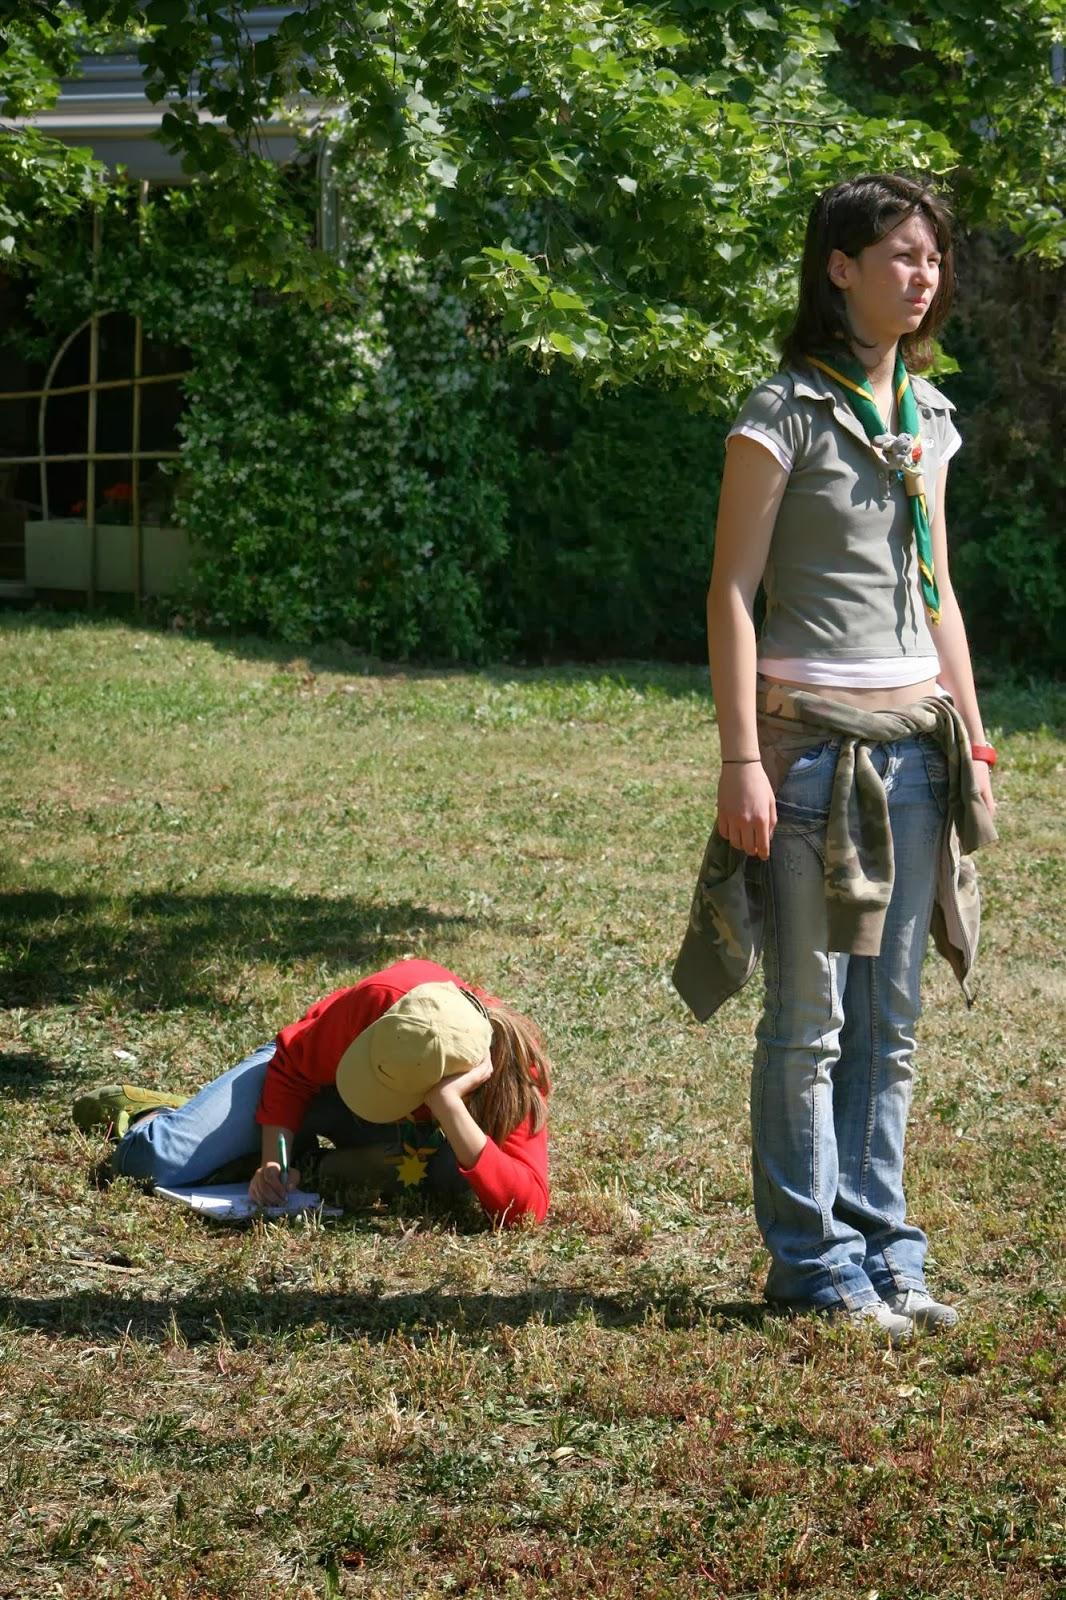 Področni mnogoboj, Sežana 2007 - IMG_7953.jpg